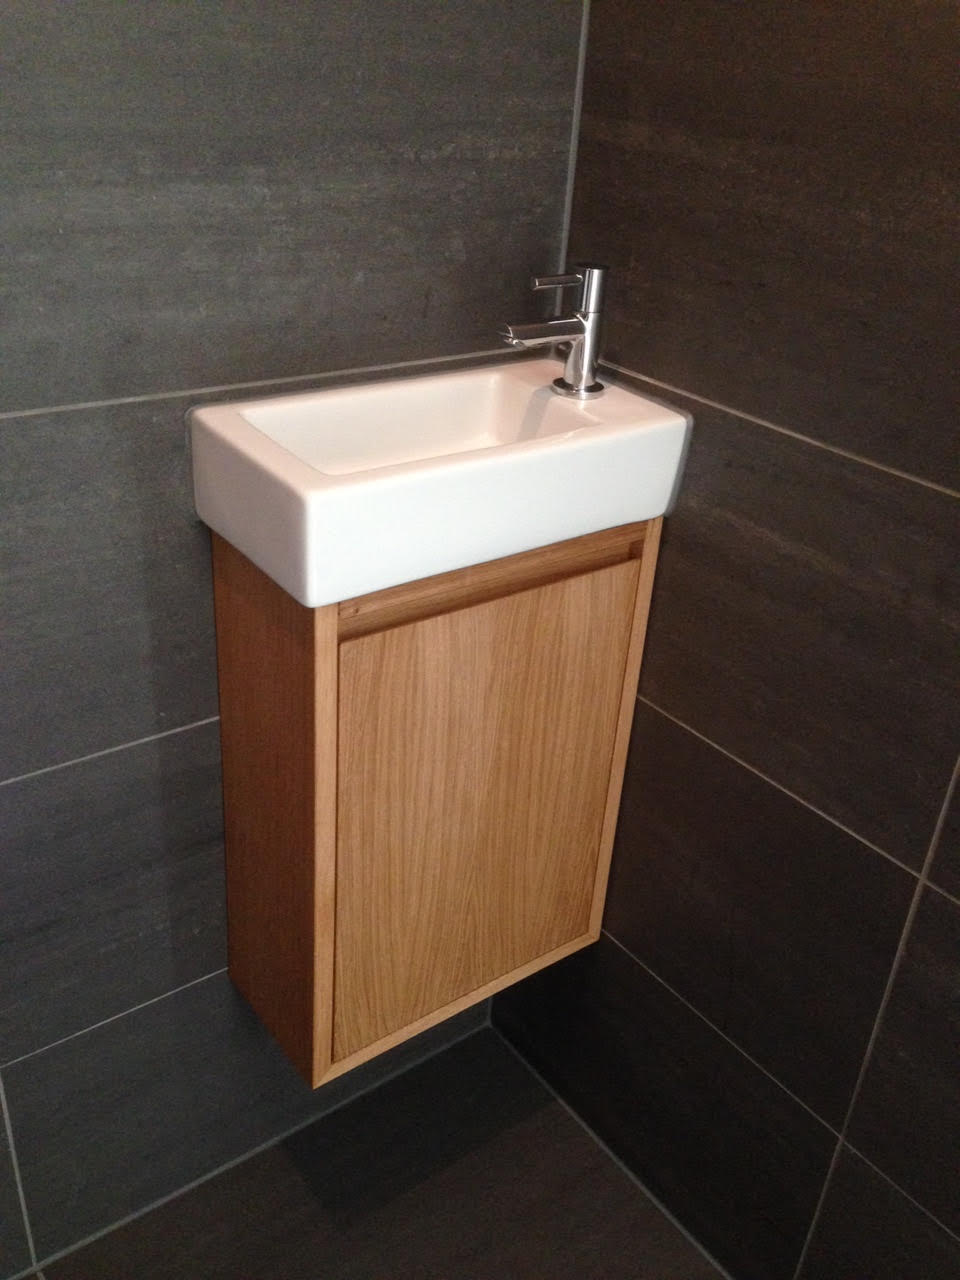 Toiletmeubel interieur meubilair idee n - Spiegel wc ontwerp ...